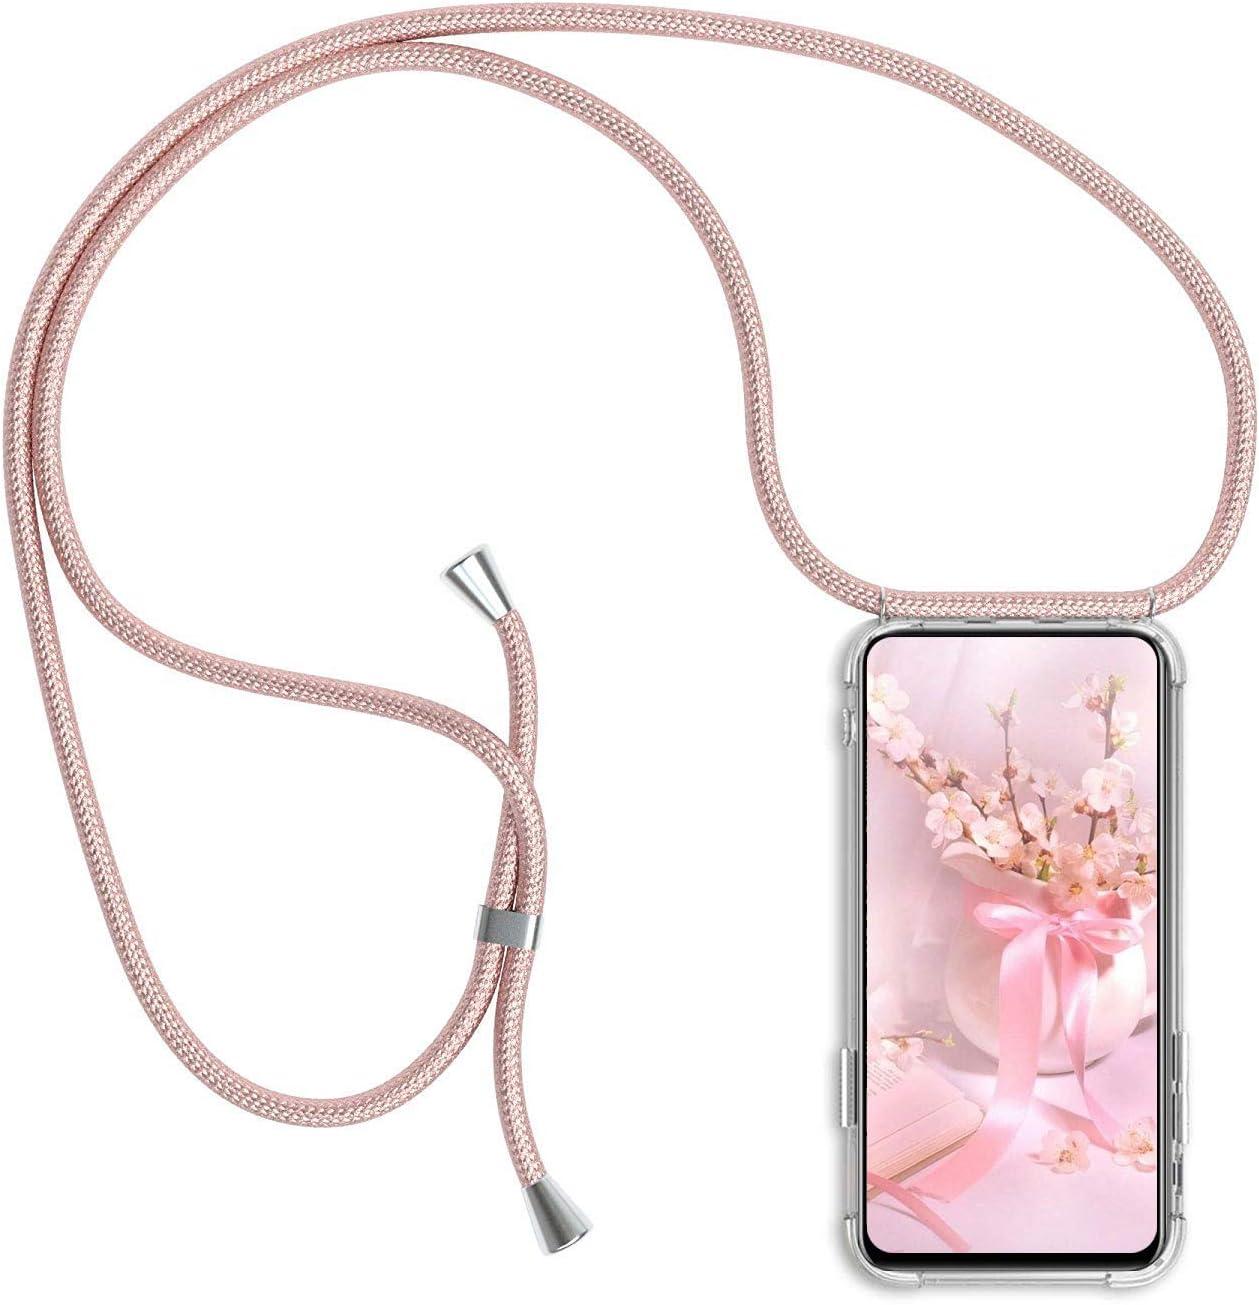 Funda para Xiaomi Mi 11 Lite 4G/5G con Cuerda, Ultrafina Suave Silicona TPU Transparente Carcasa de movil con Colgante [Moda y Practico] [Anti-rasguños Anti-Choque] - Oro Rosa